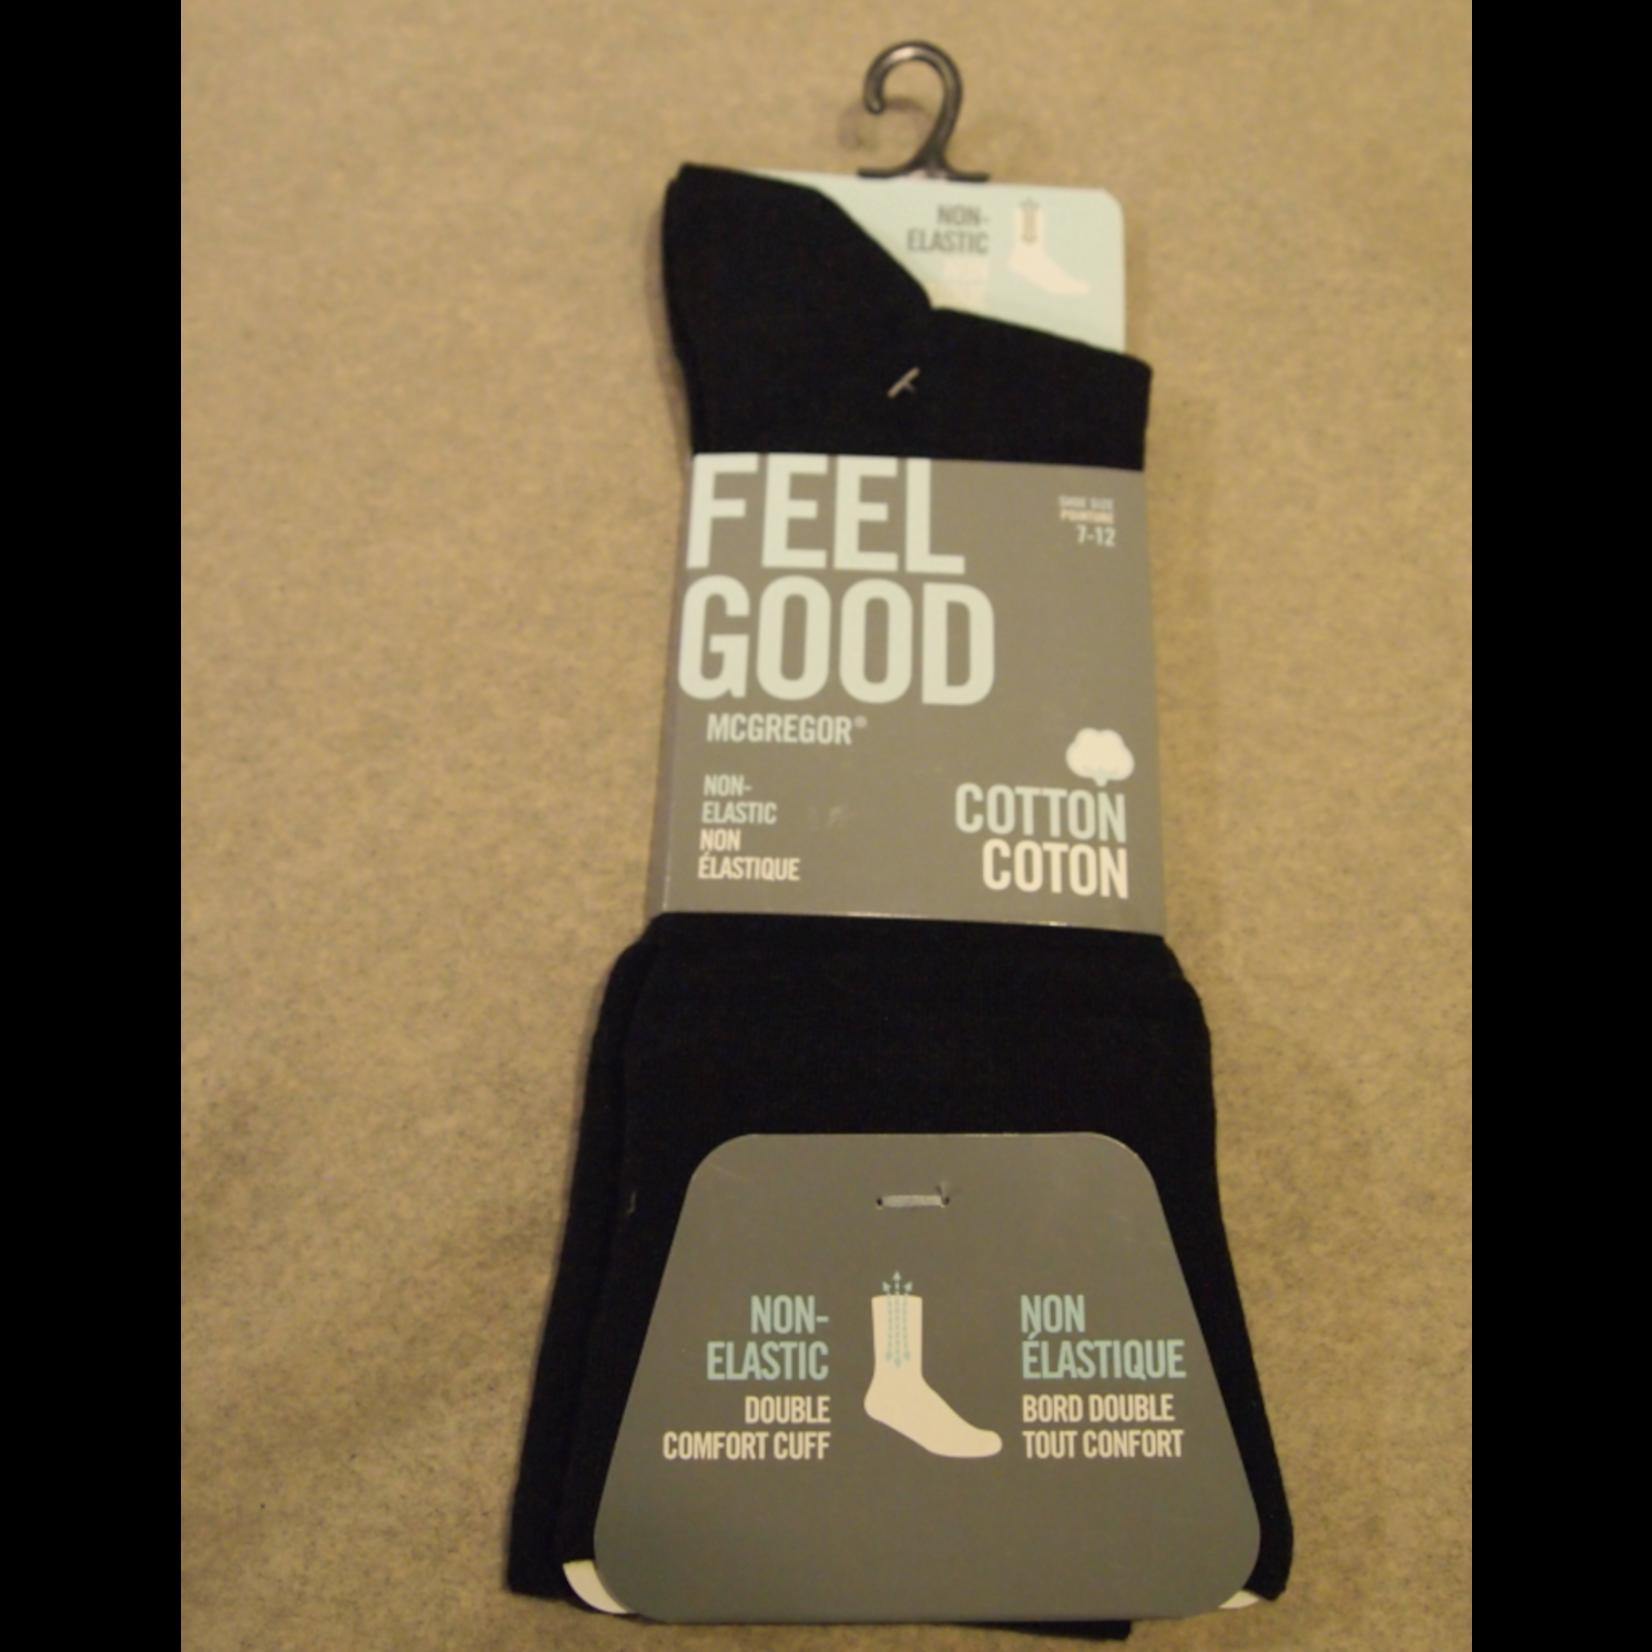 McGregor McGregor MMV150 Non-Elastic Feel Good Sock Black